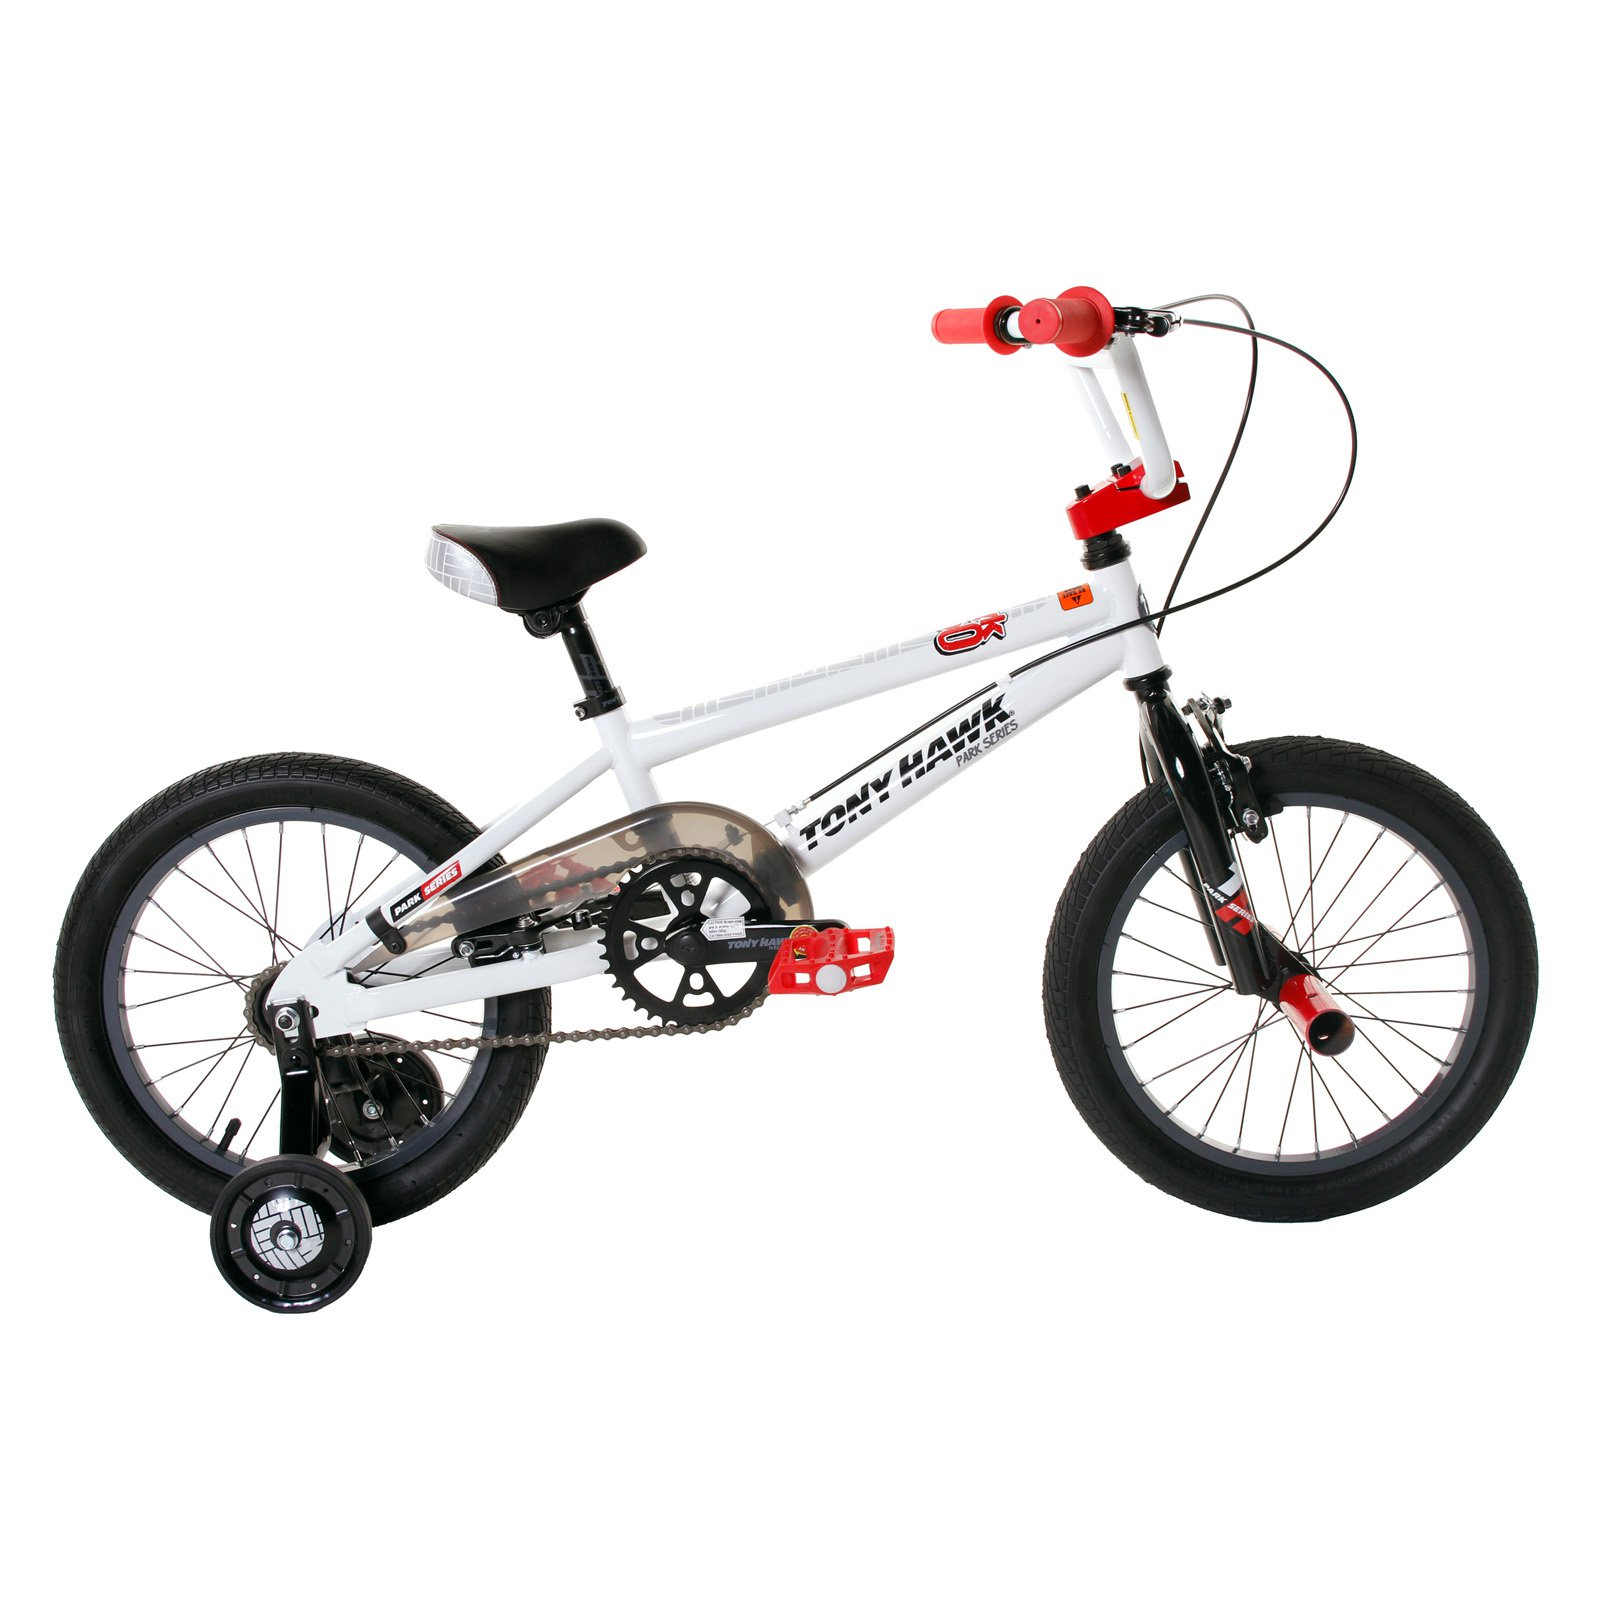 "Dynacraft 16"" Boys' Tony Hawk HWK 360 Bike by Dynacraft BSC"